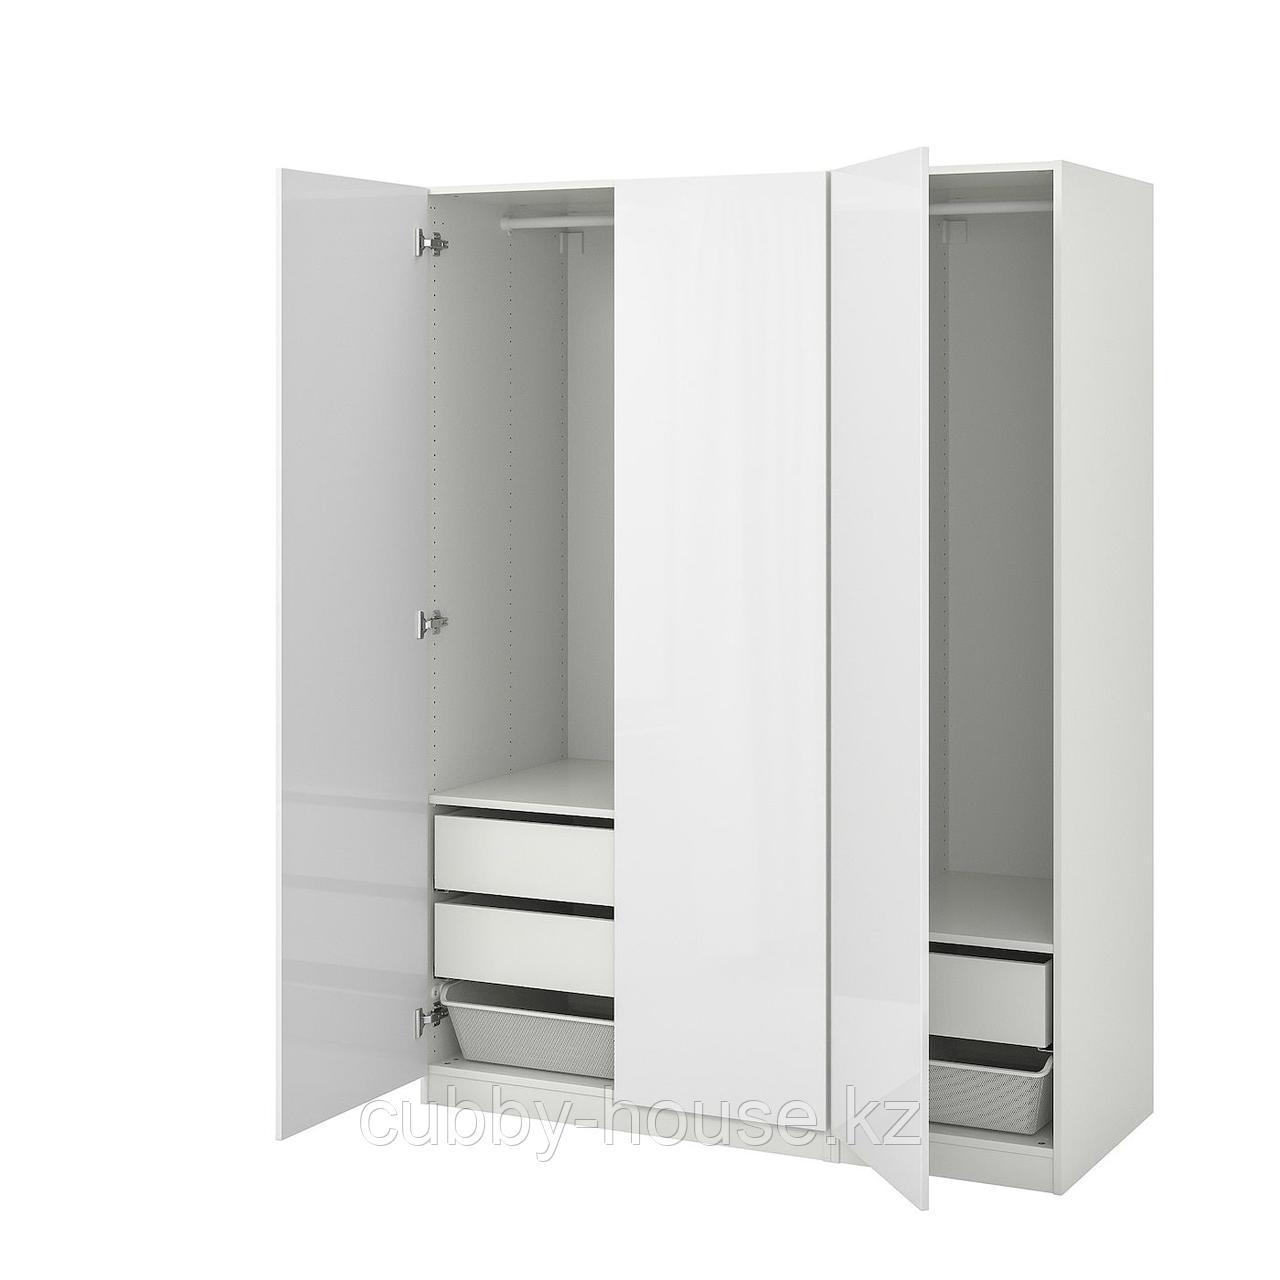 ПАКС Гардероб, белый, Фардаль глянцевый/белый, 150x60x236 см